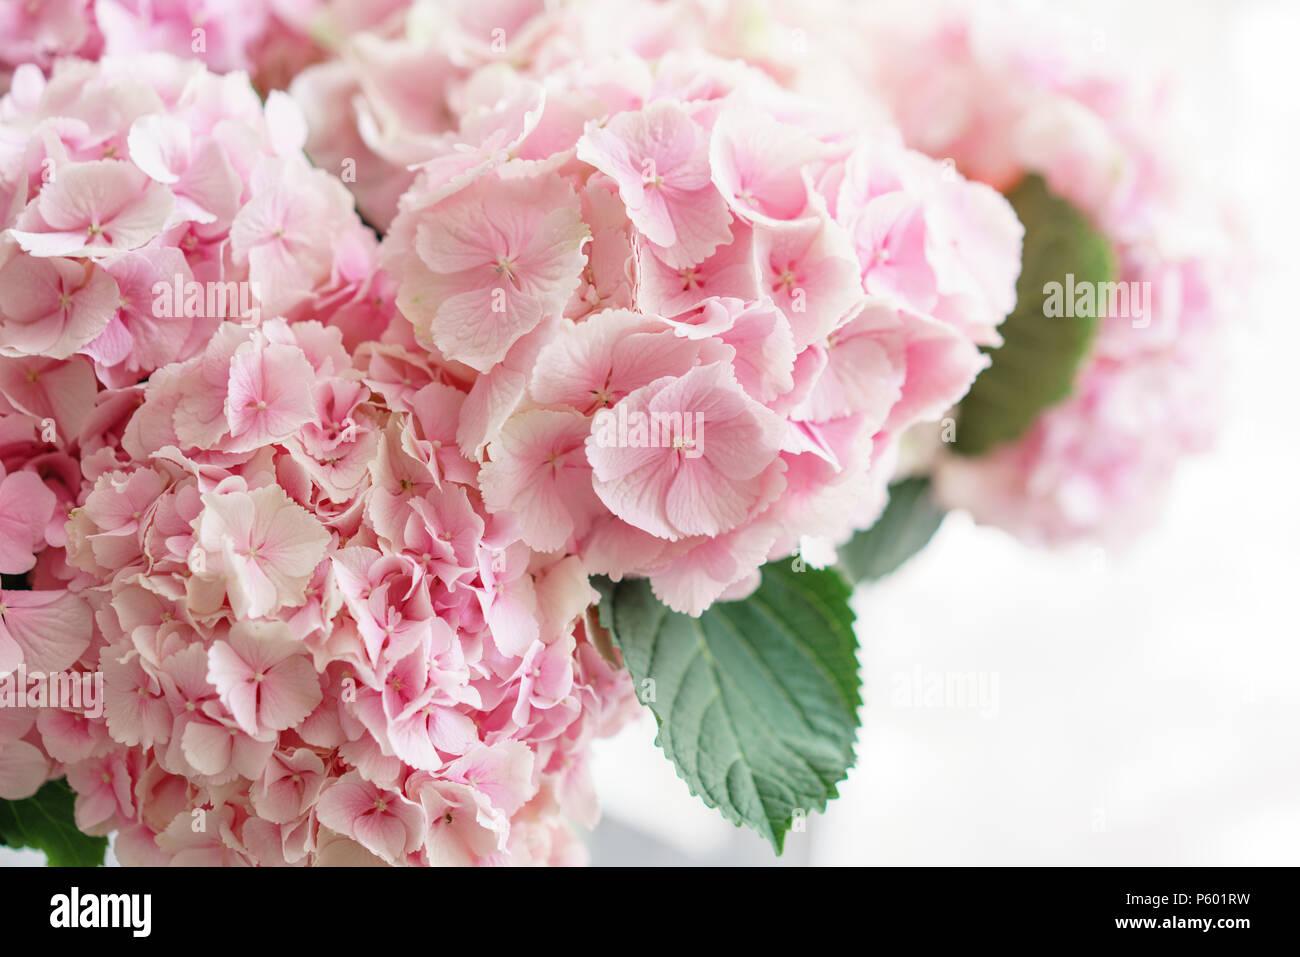 Carta Da Parati Fiori Rosa : Bella hydrangea fiori in un vaso su una tavola . bouquet di luce blu